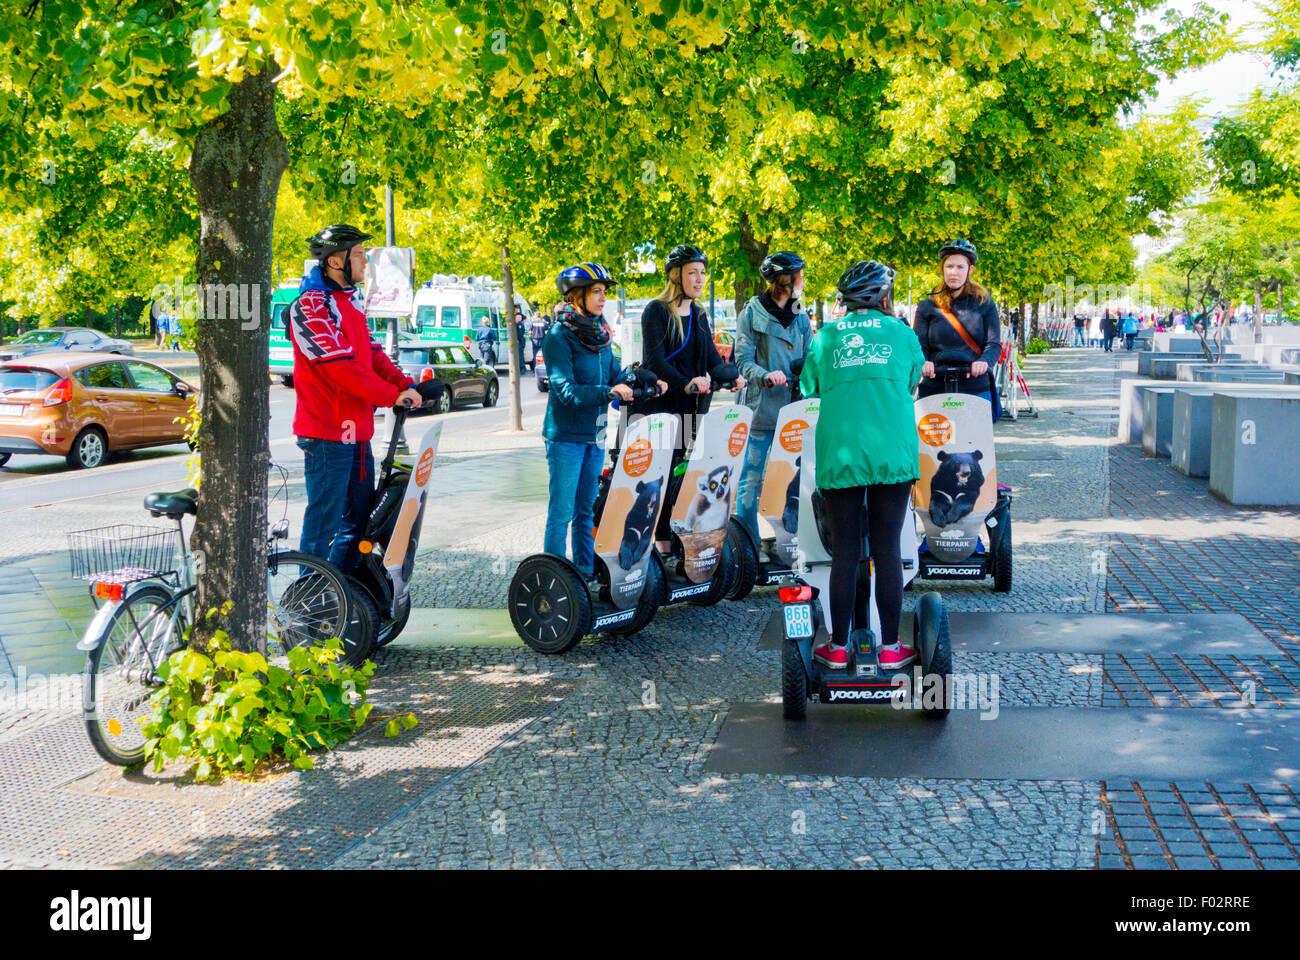 Segway guided tour, Tiergarten, Berlin, Germany - Stock Image